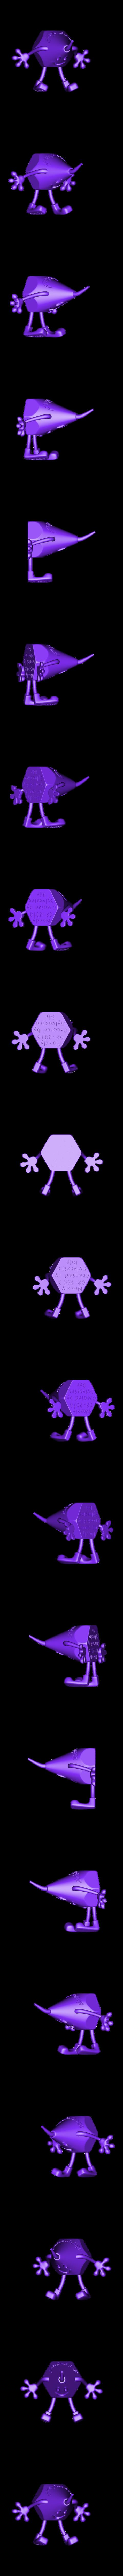 Nozzly-V7.stl Download free STL file Nozzly Mascot Stratomaker • 3D printer design, Sylvestre-Bdr